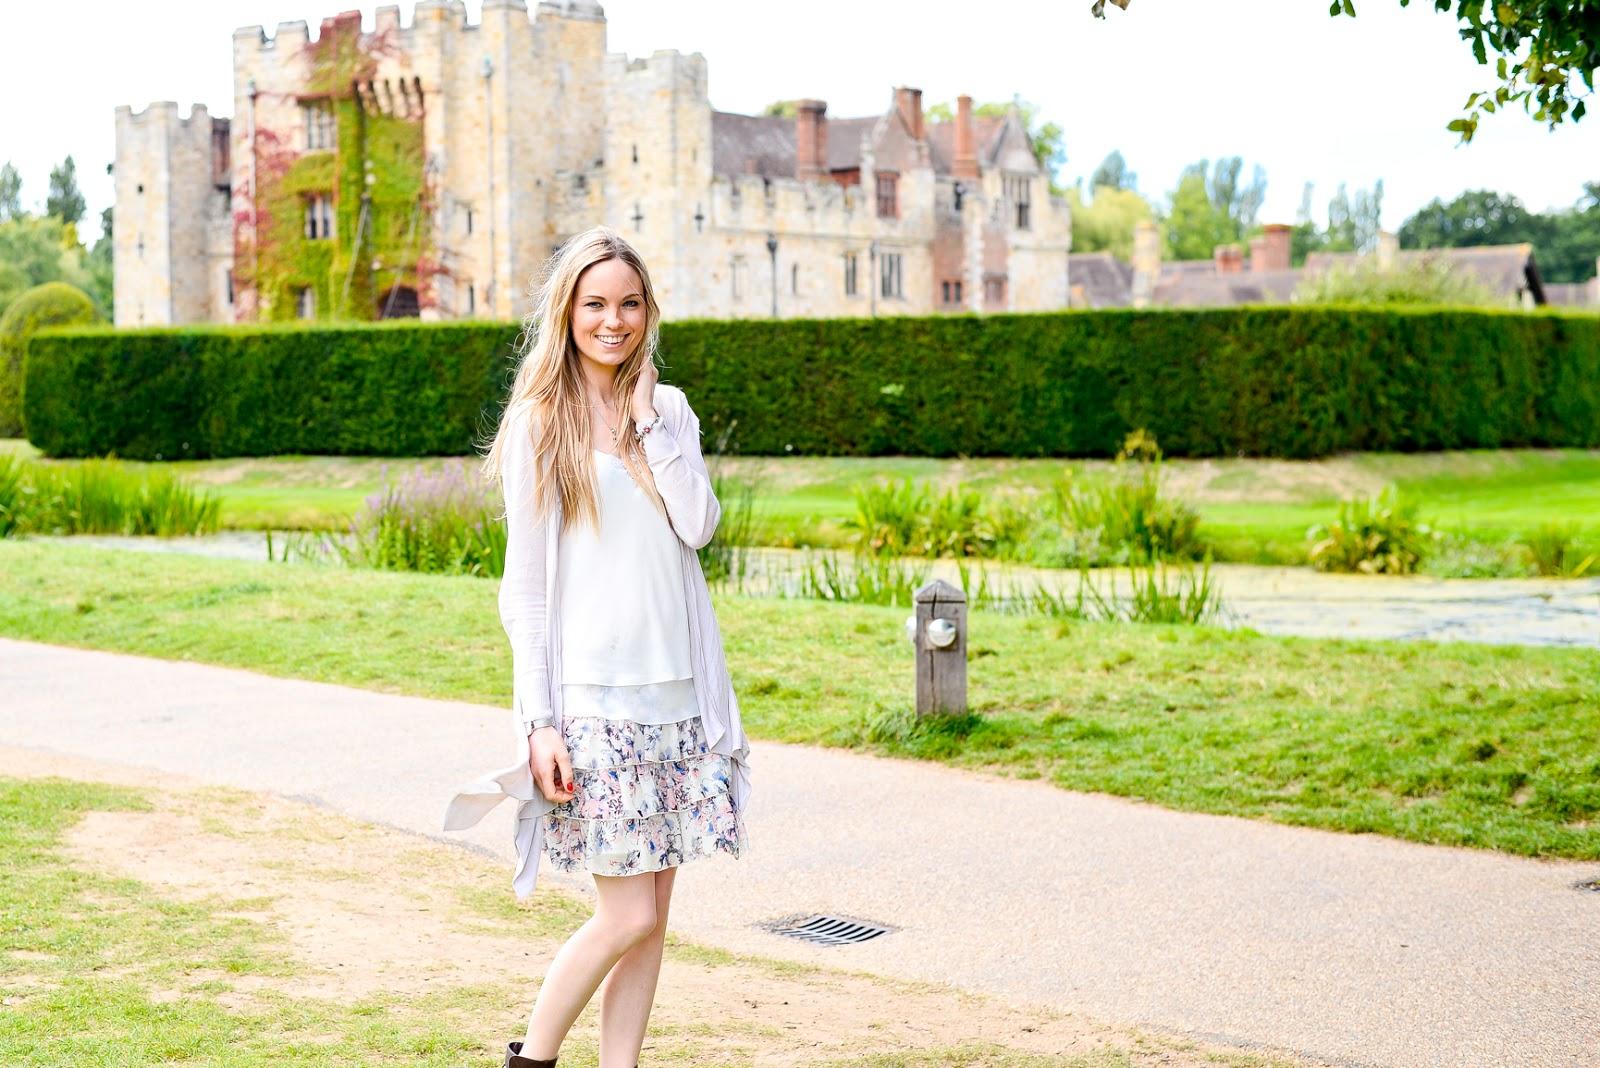 Staying At Hever Castle, Hever Castle, Anne Boleyn's Childhood Home, Anne Boleyn, King Henry VIII, Jousting, English History, Royal Tudor Places